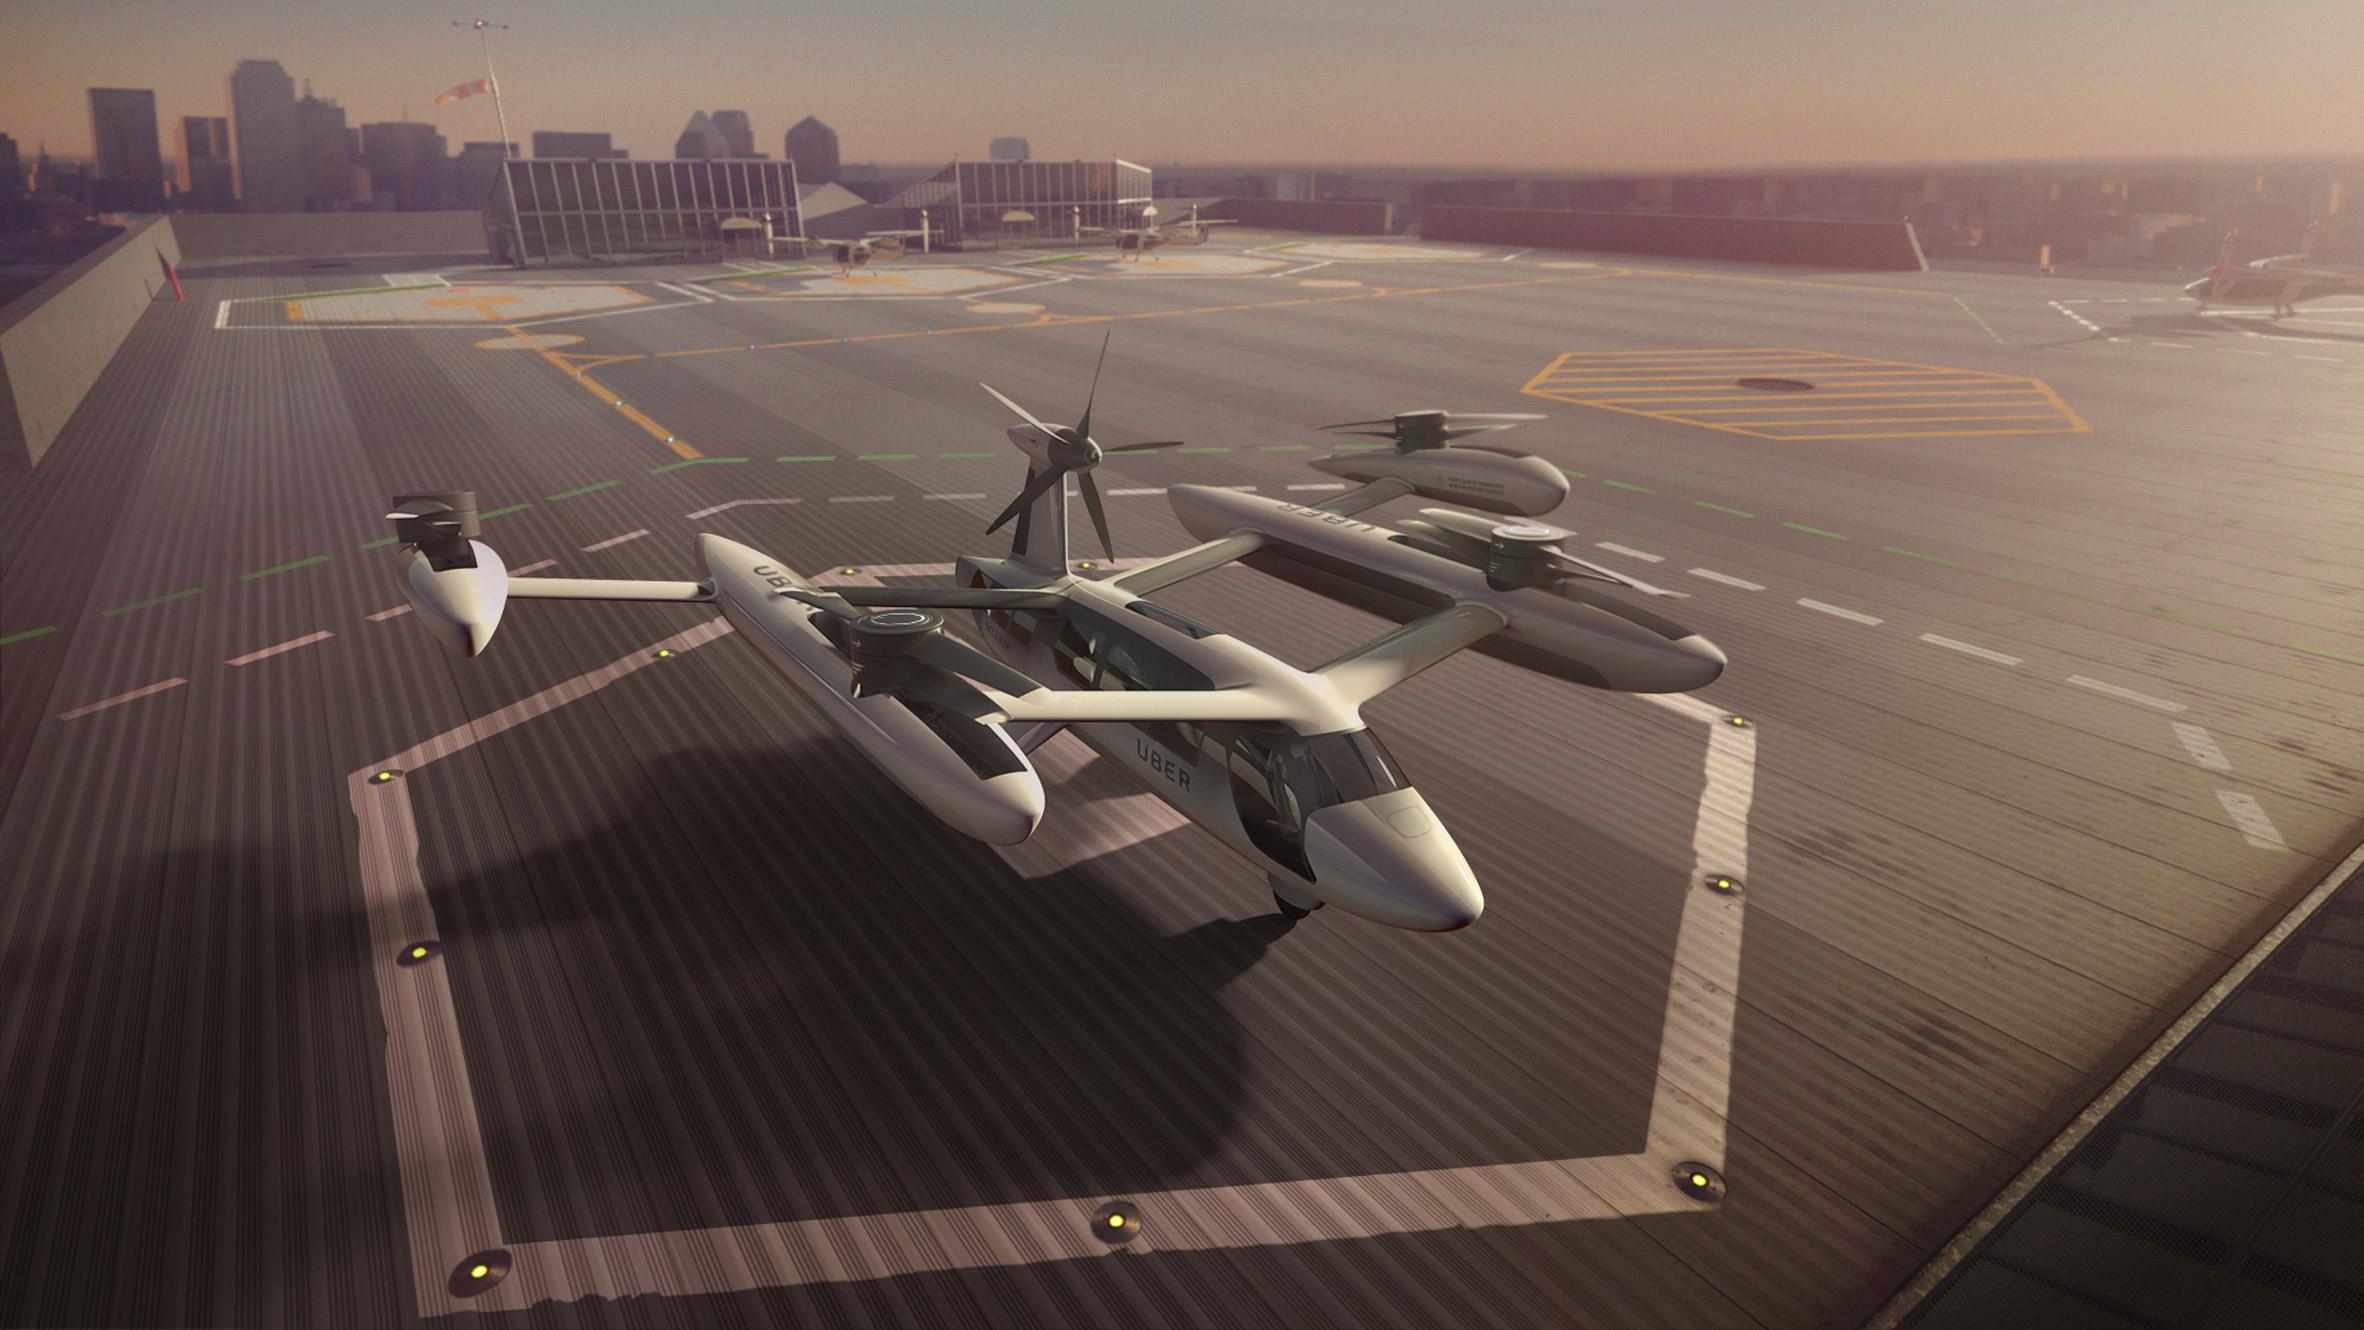 An illustrative model of Uber's electric vertical takeoff and landing vehicle (eVTOL).